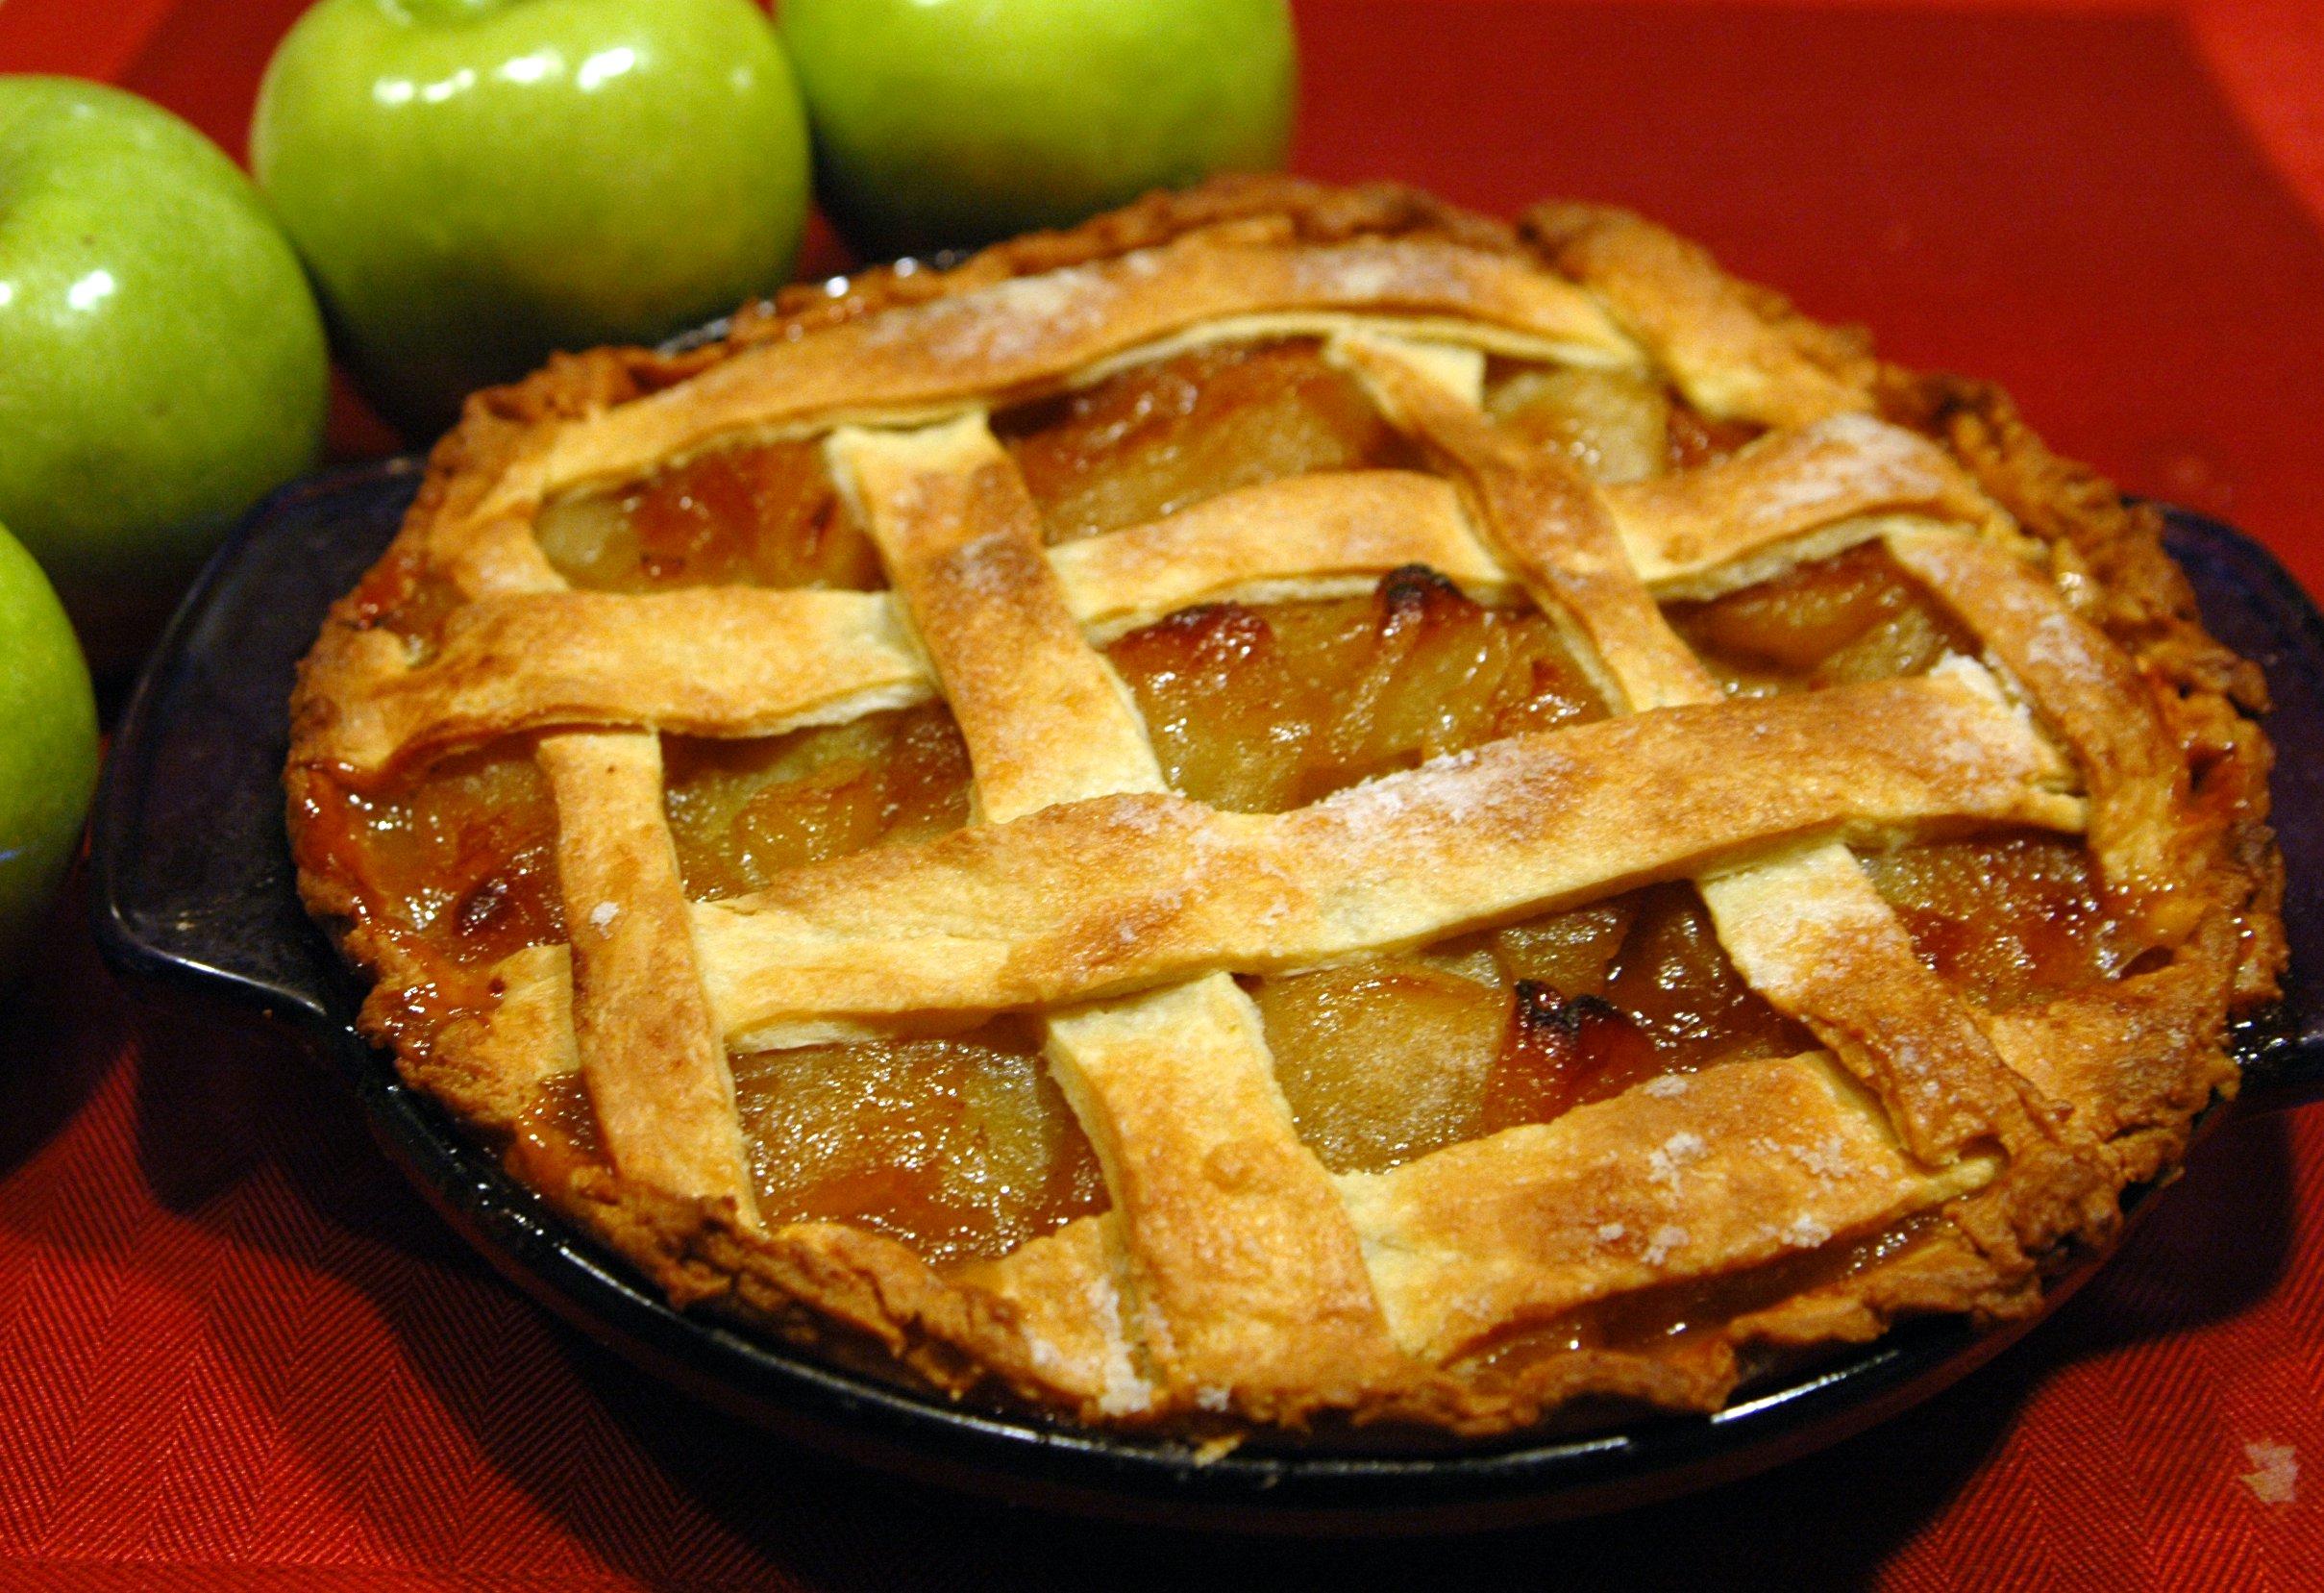 Pie and Praise:Sunday, November 25, 7-8 PM